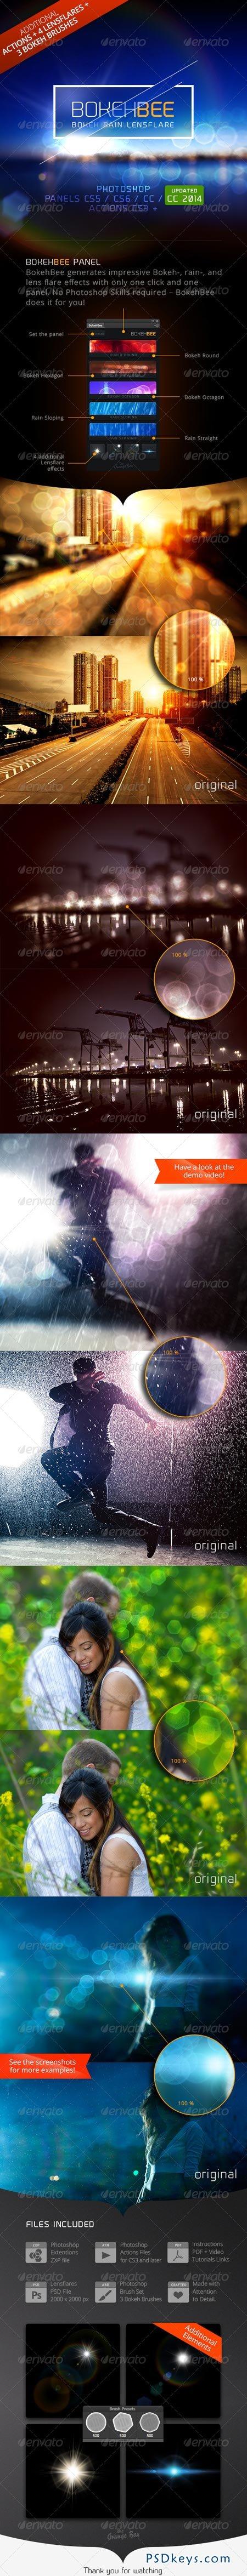 BokehBee - Bokeh Rain Lens-Flare Generator 6858473